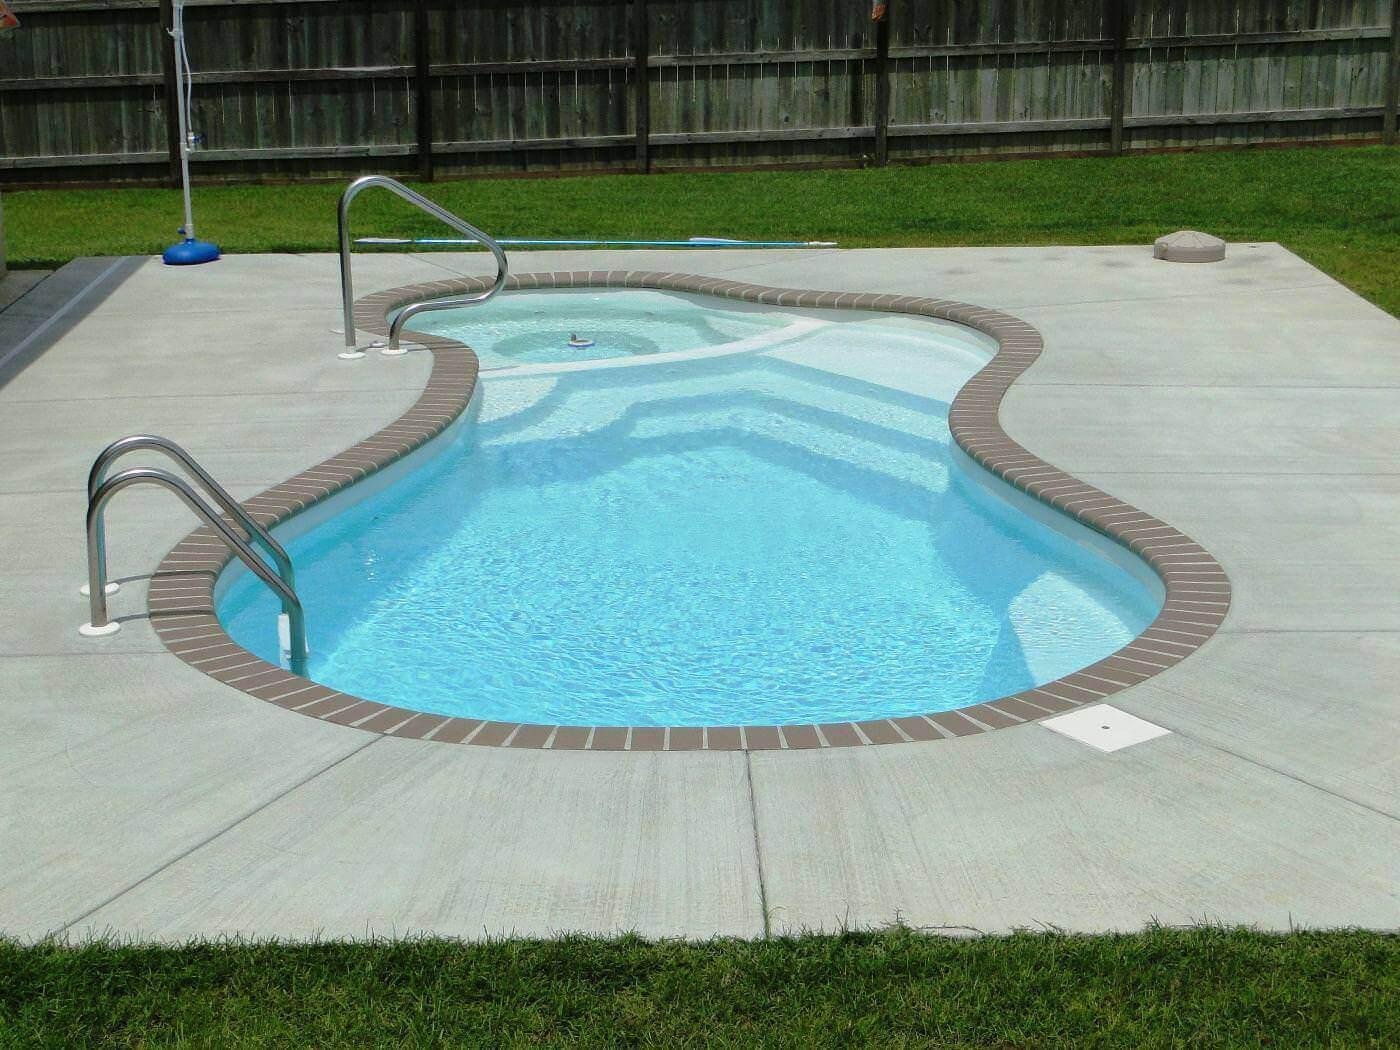 Best ideas about DIY Pool Kits . Save or Pin Inground Pool Kits Now.